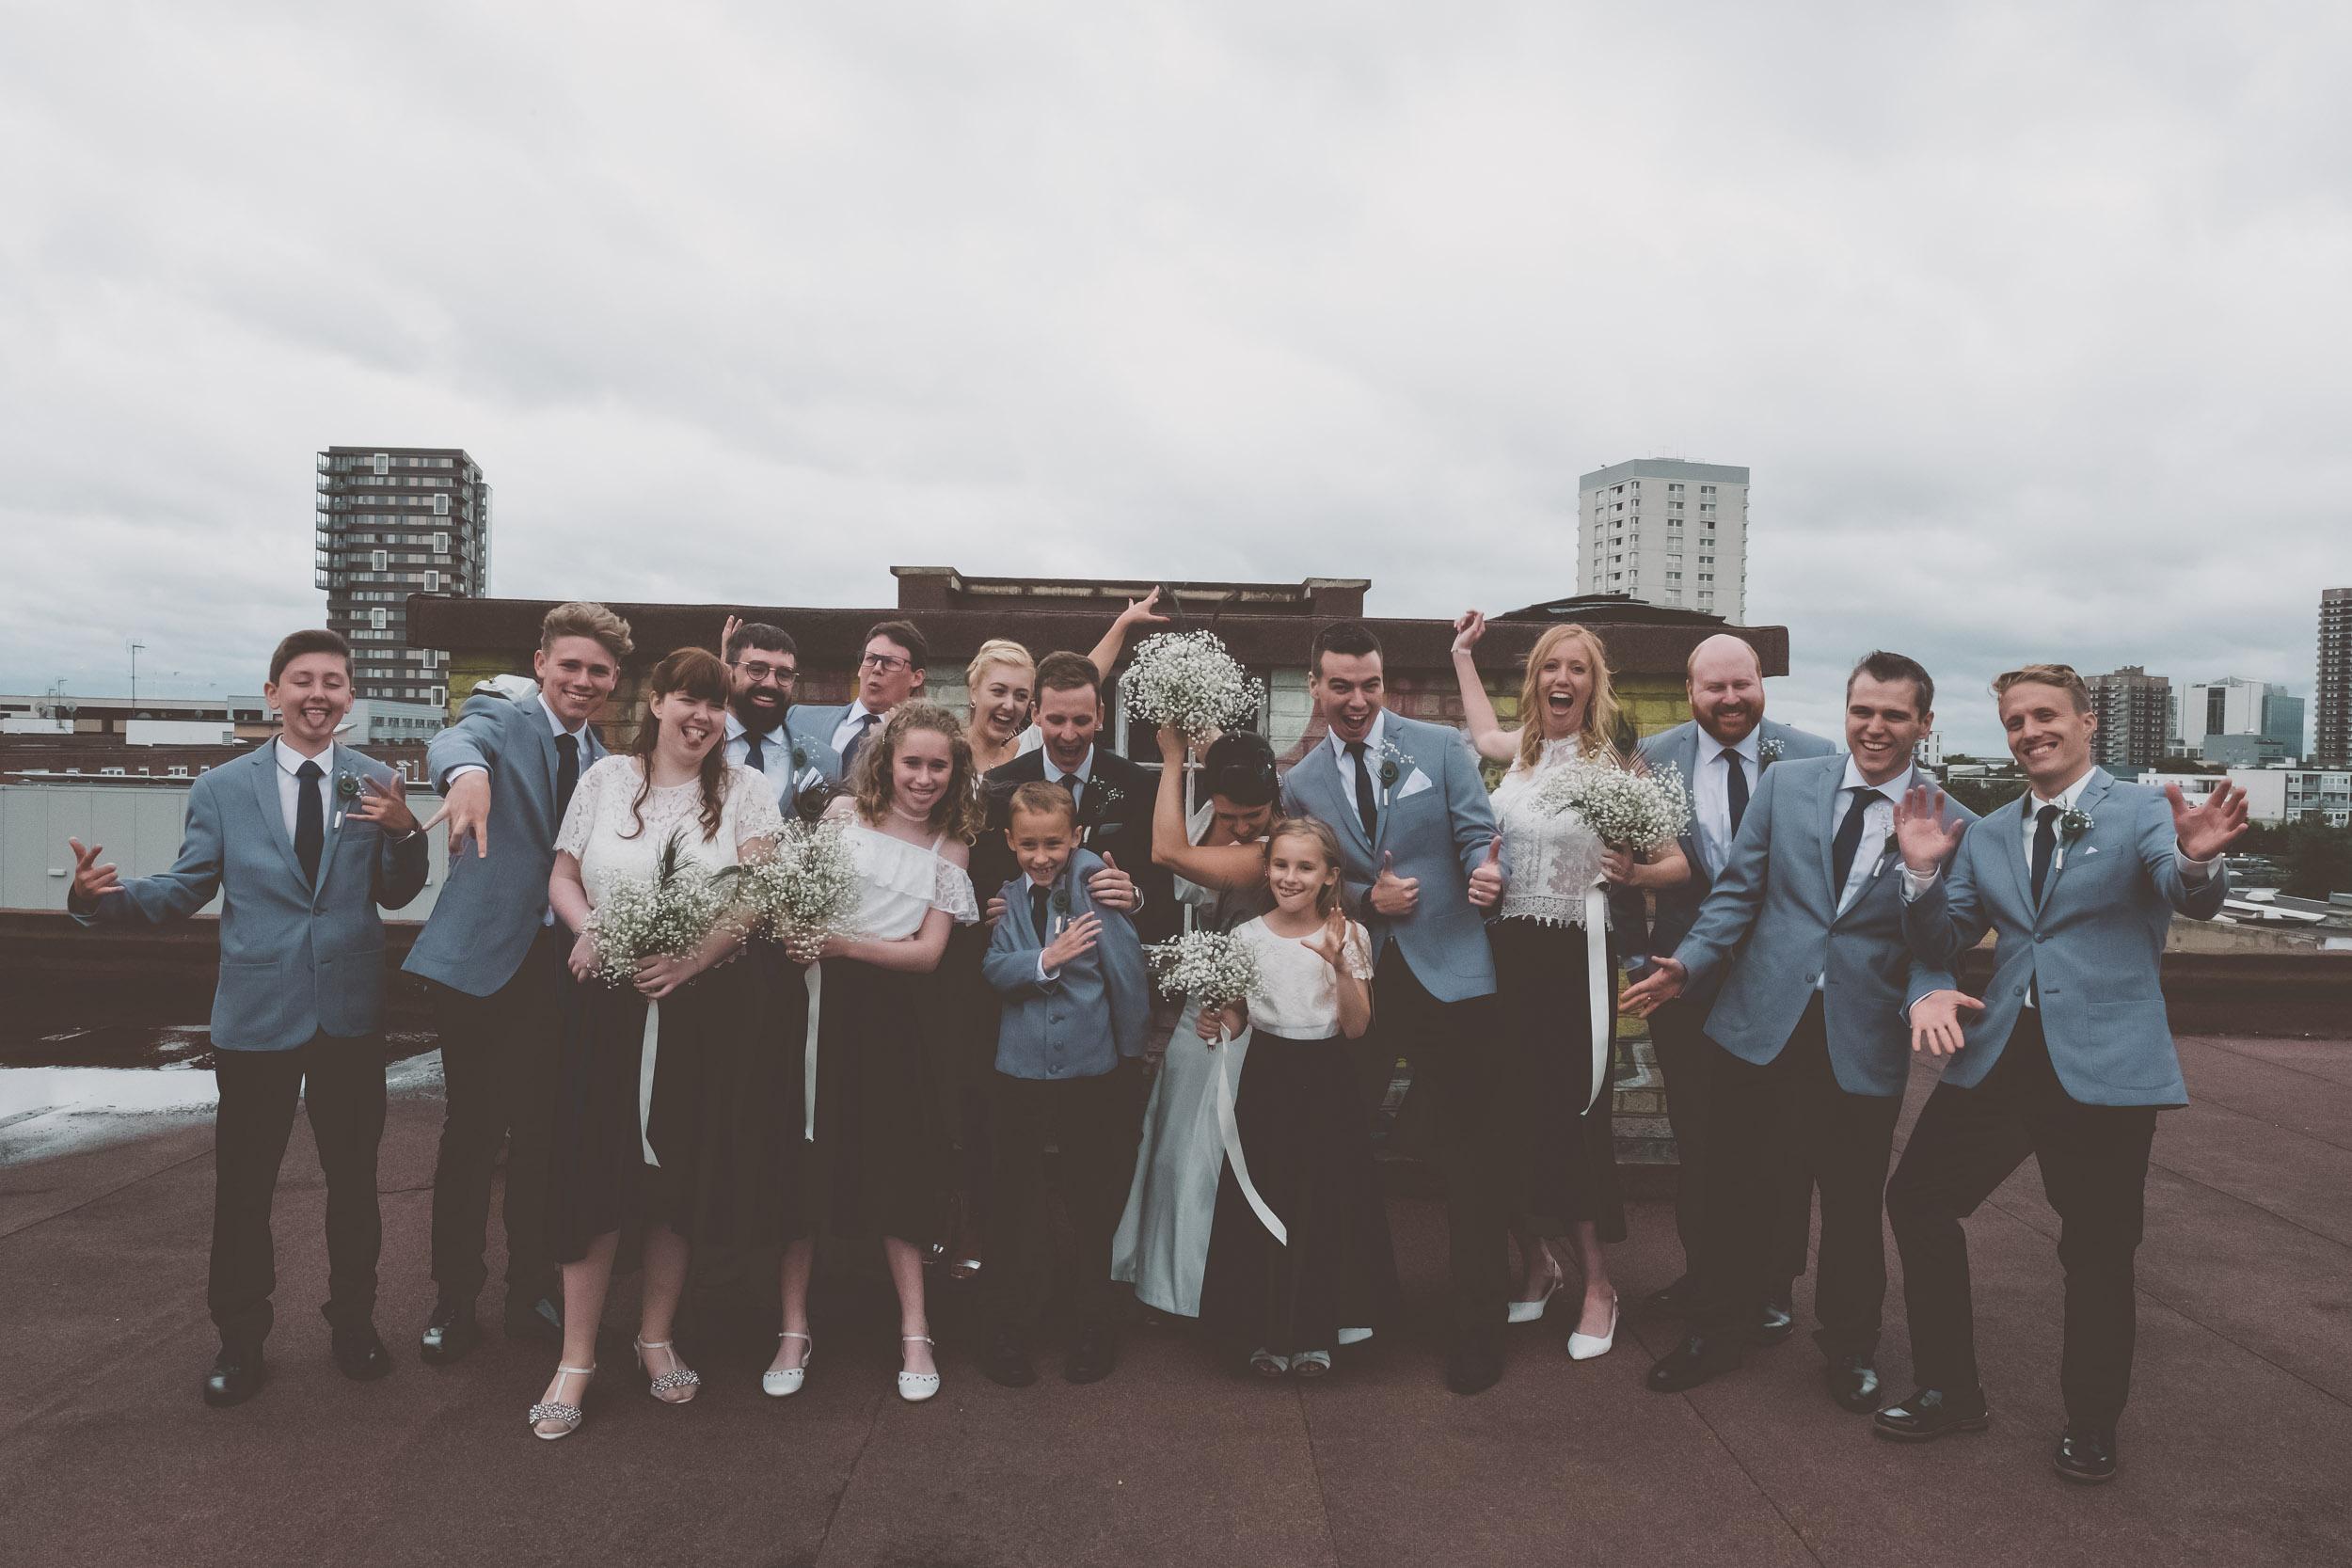 islington-town-hall-4th-floor-studios-wedding266.jpg